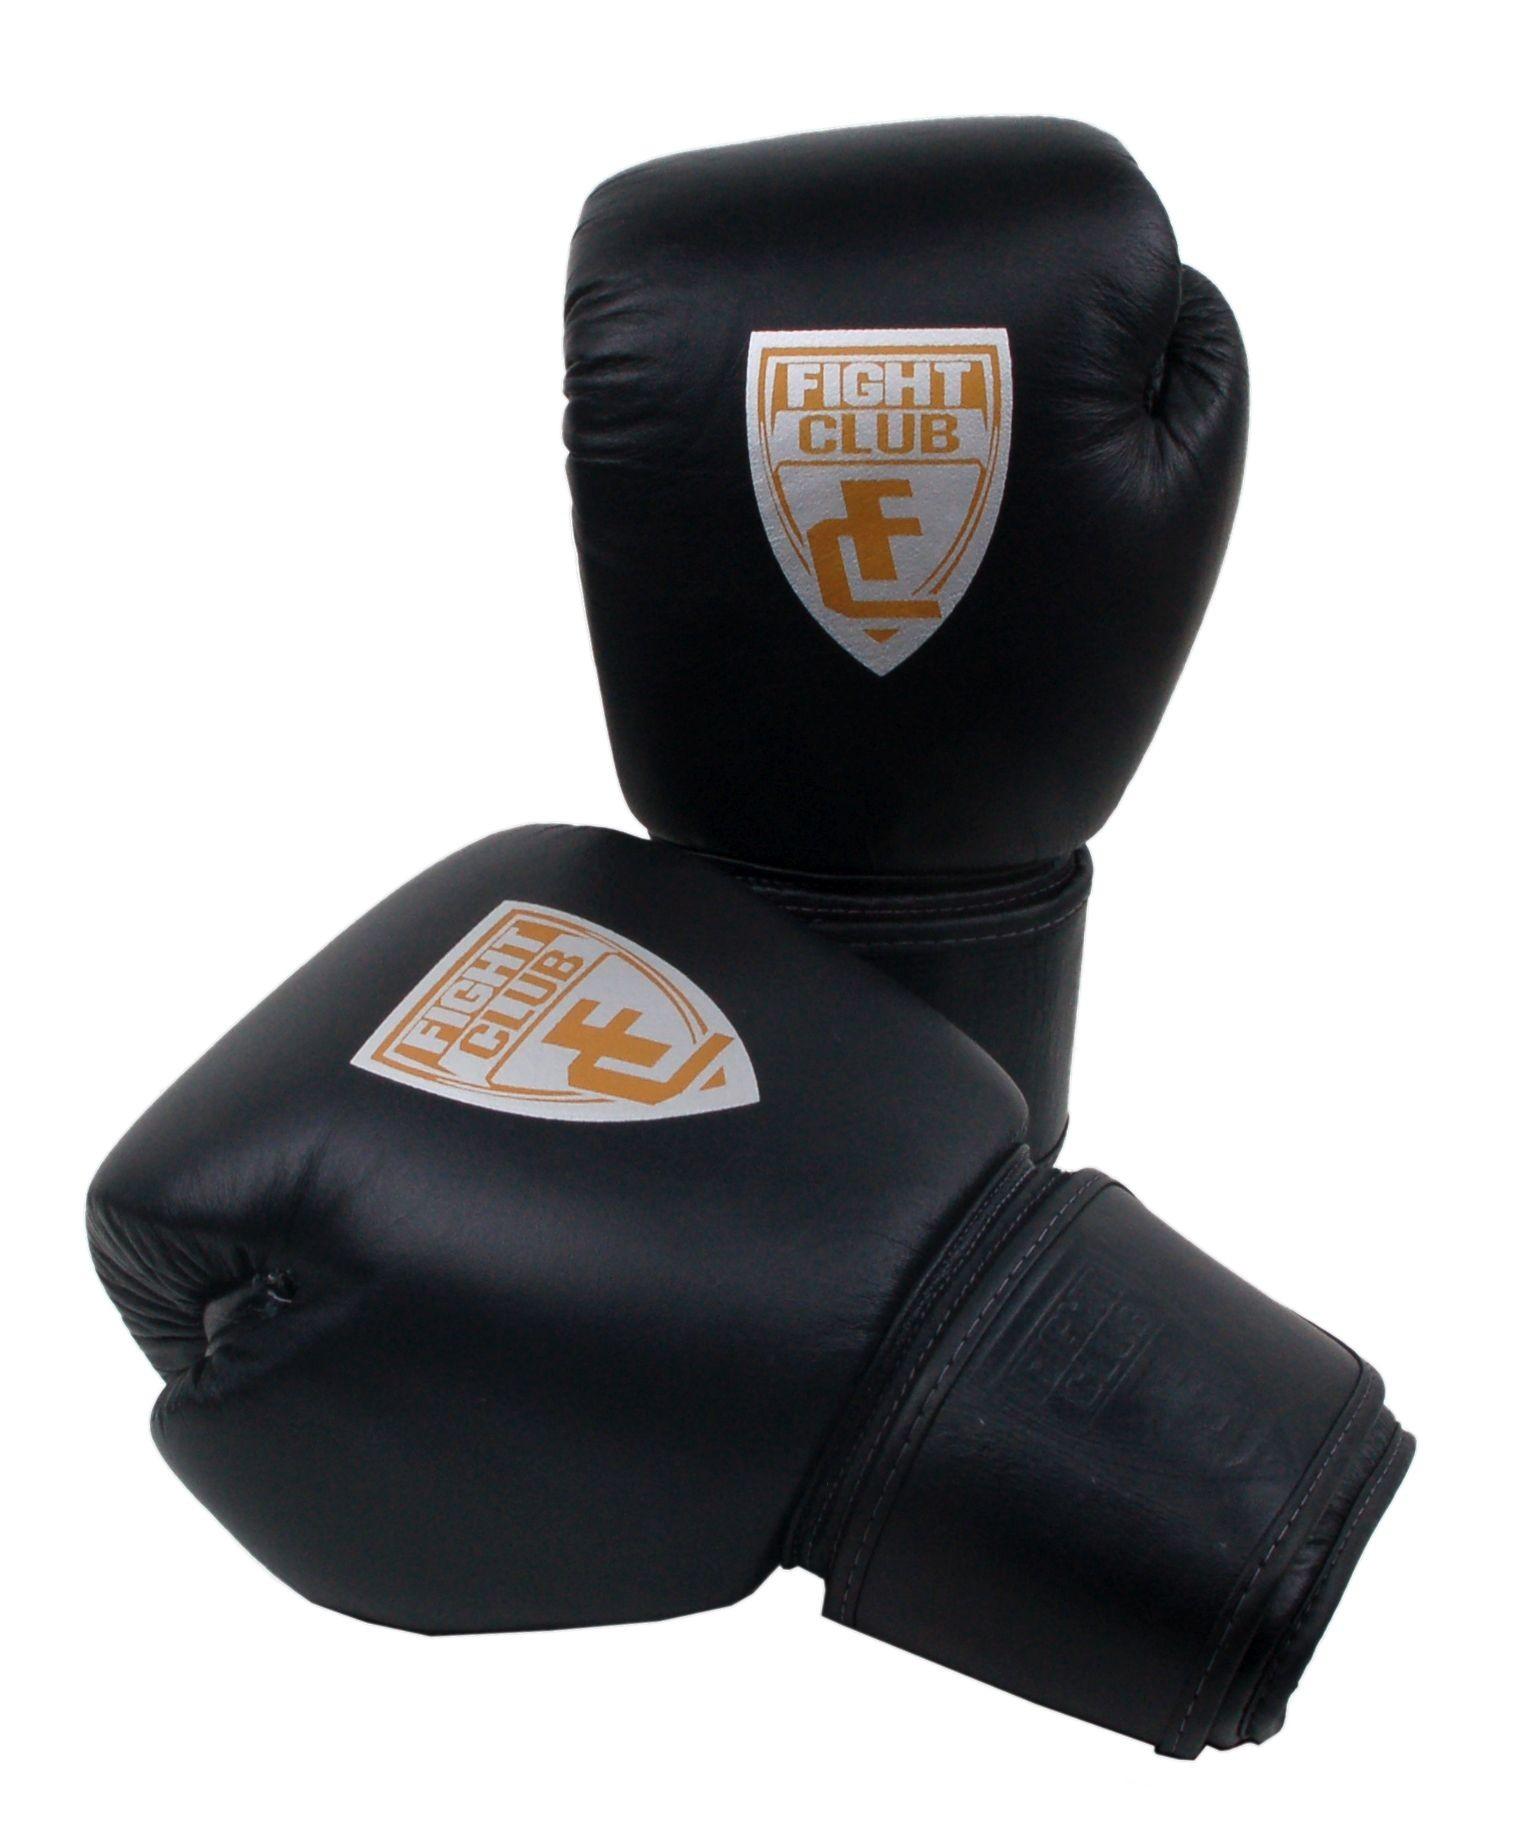 Fightclub Boxhandschuh Premium